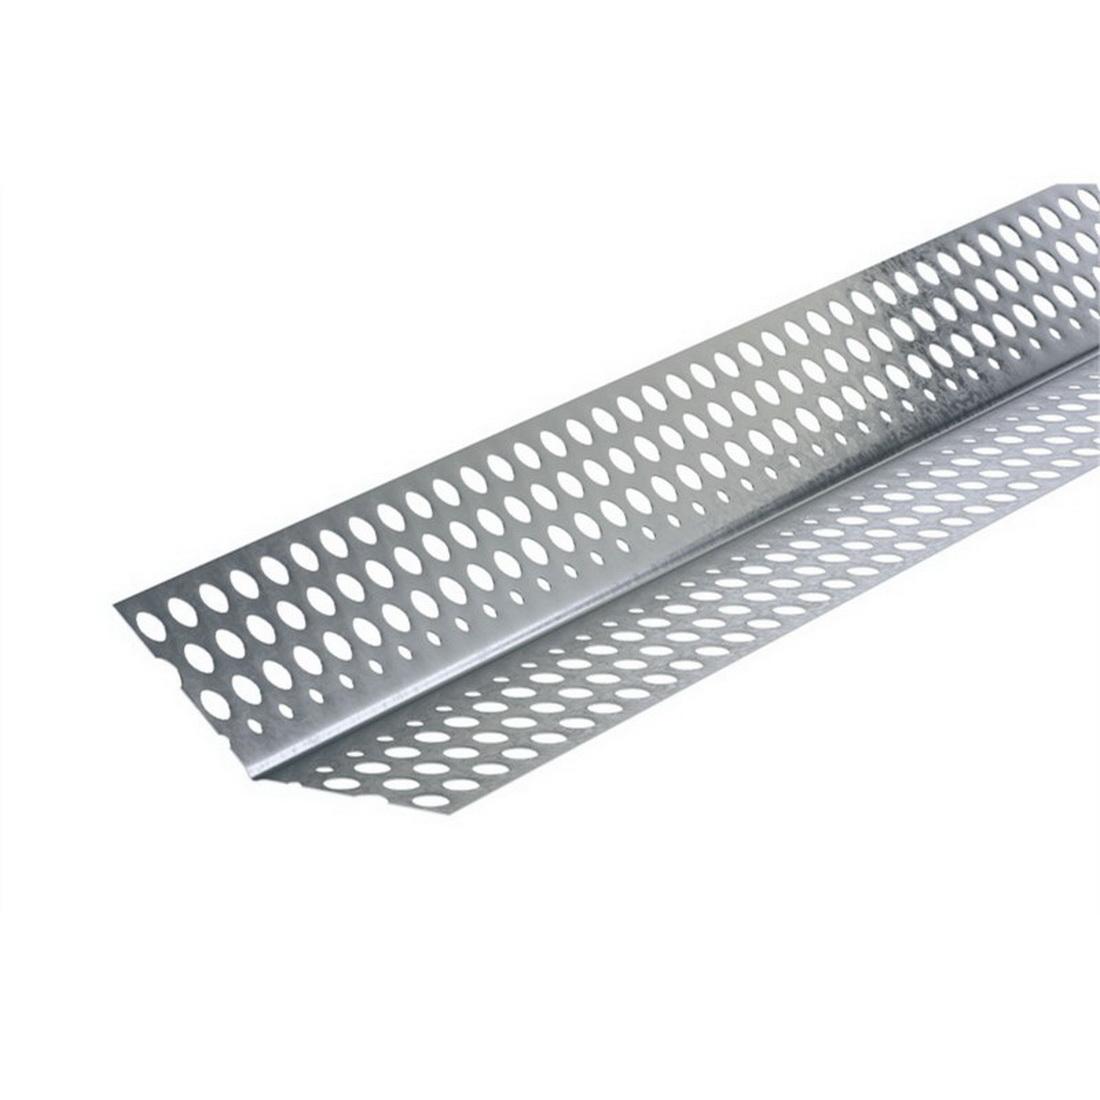 Rondo P01A External Corner Slim Anglemoulding 3000mm Galvanized Steel 135 deg